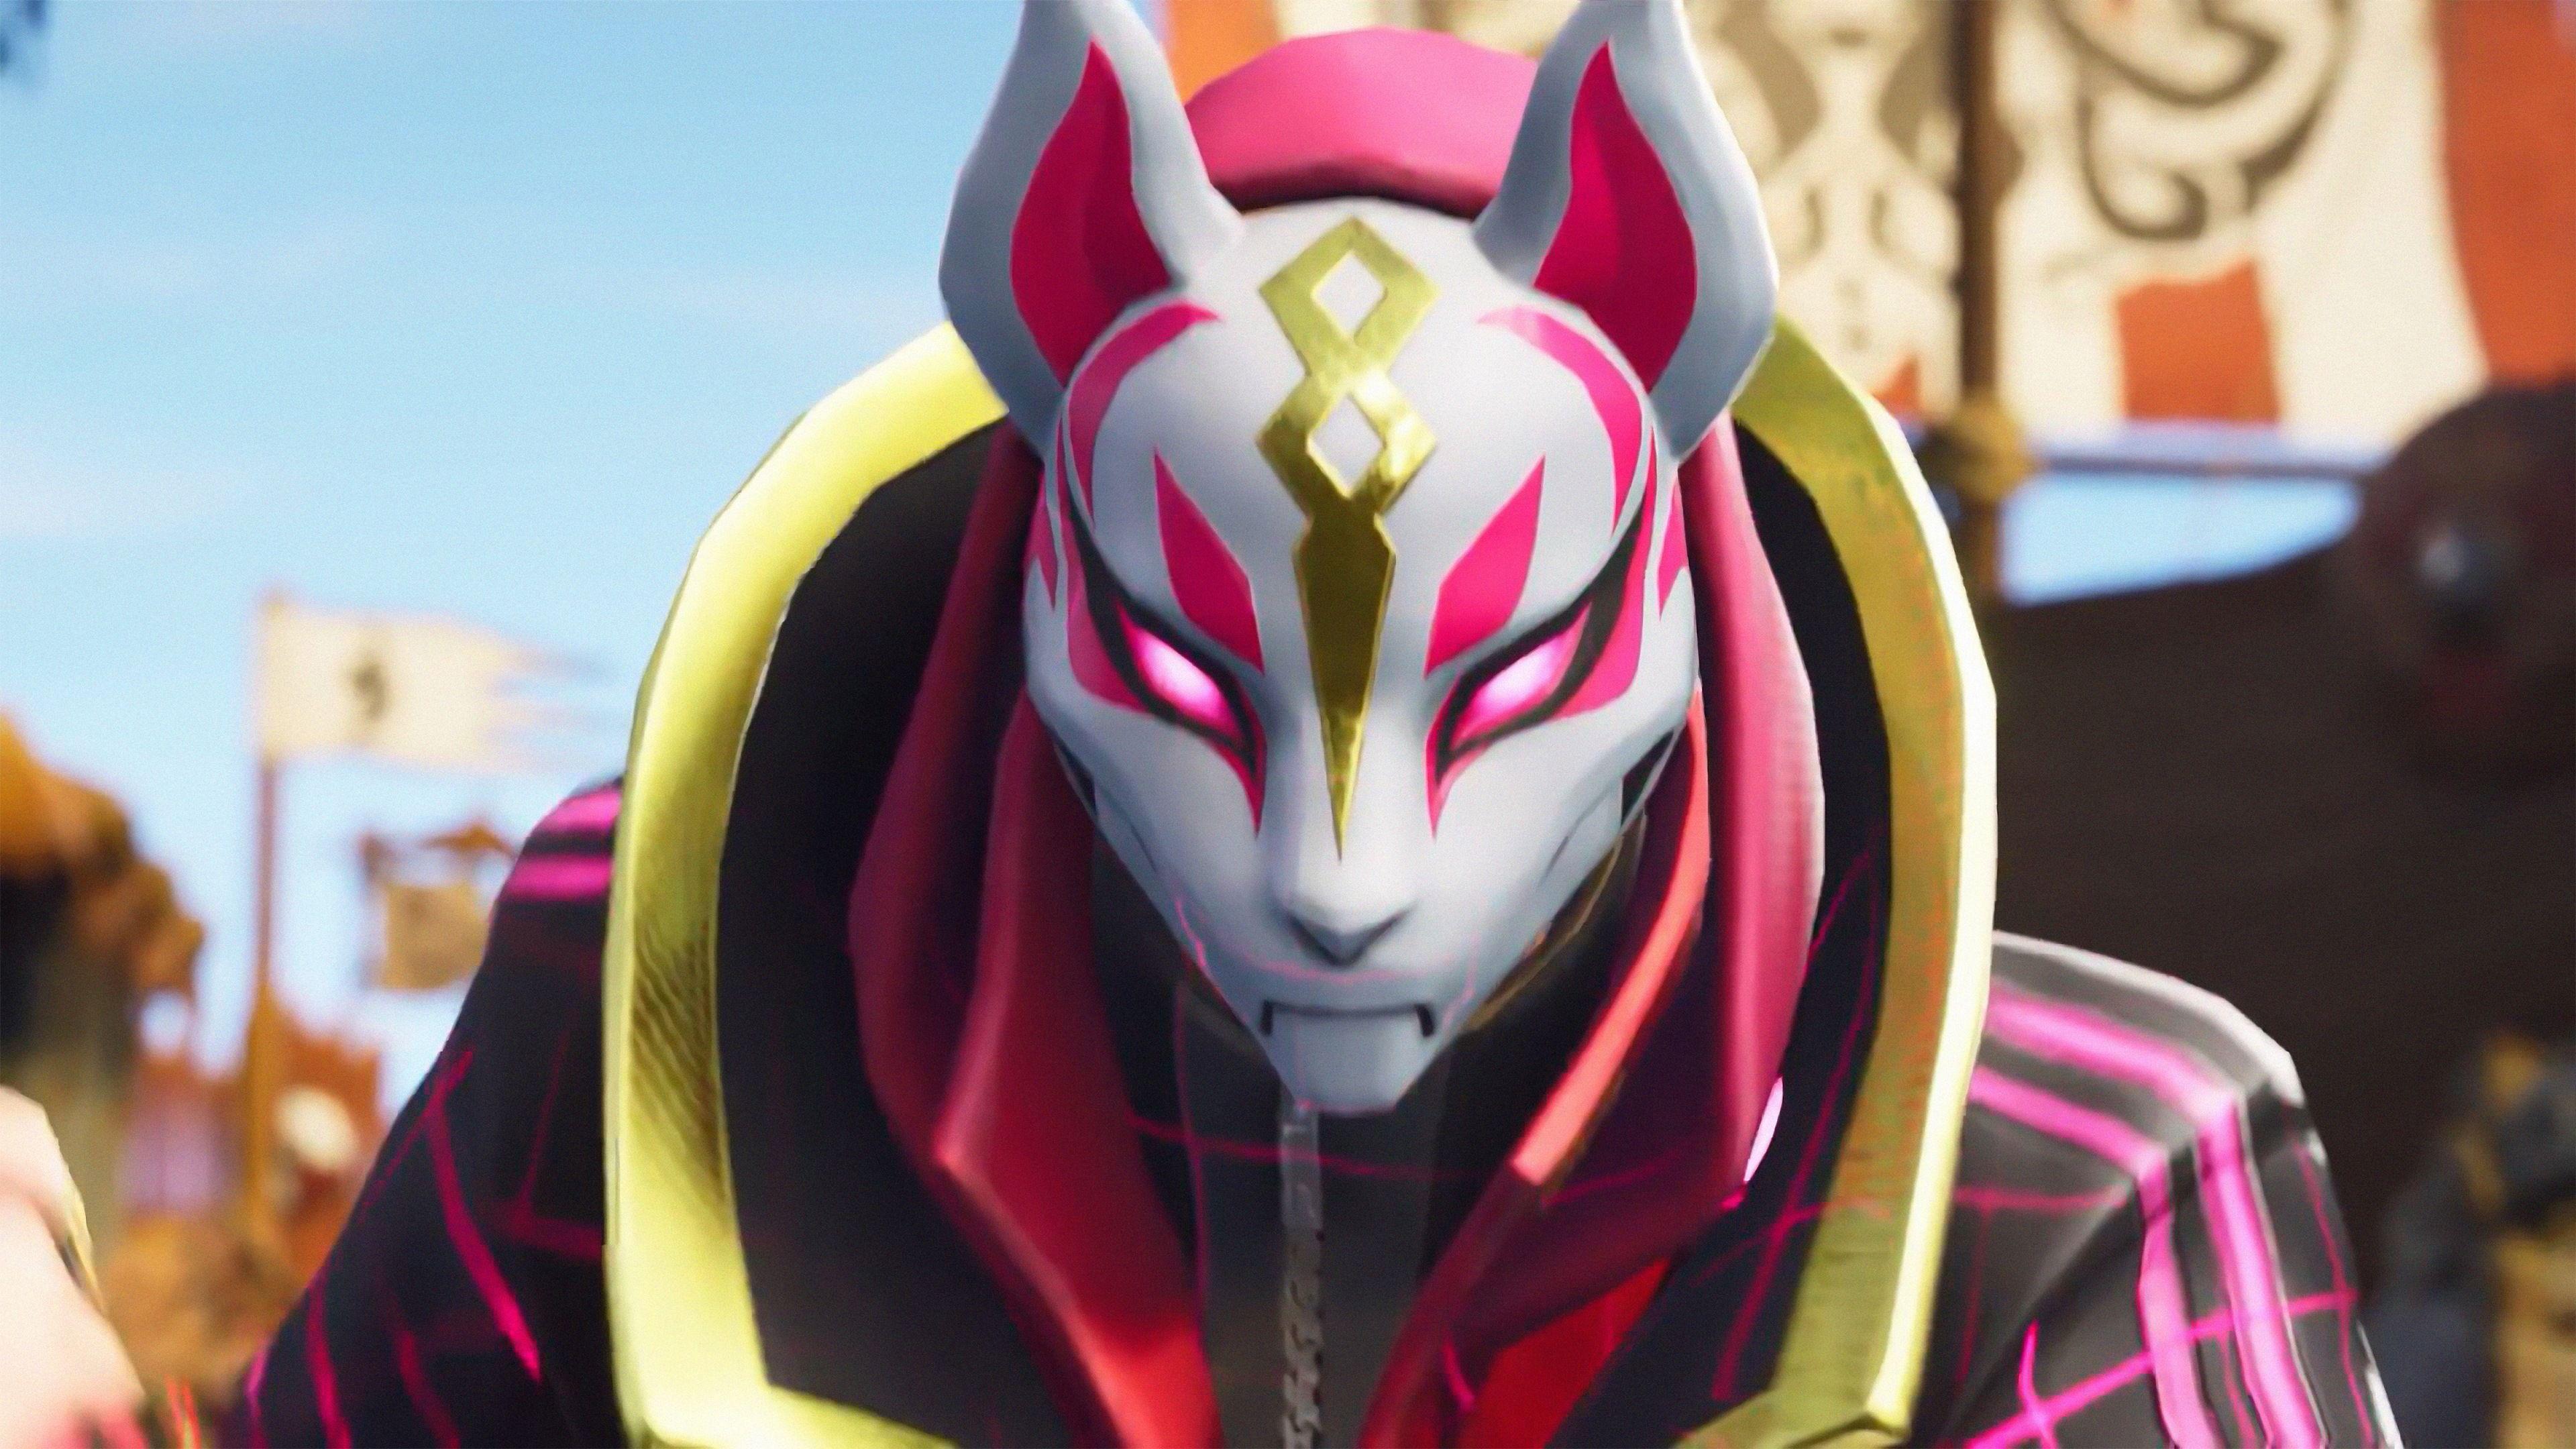 Drift Kitsune Mask Fortnite Battle Royale Video Game 3840x2160 3840x2160